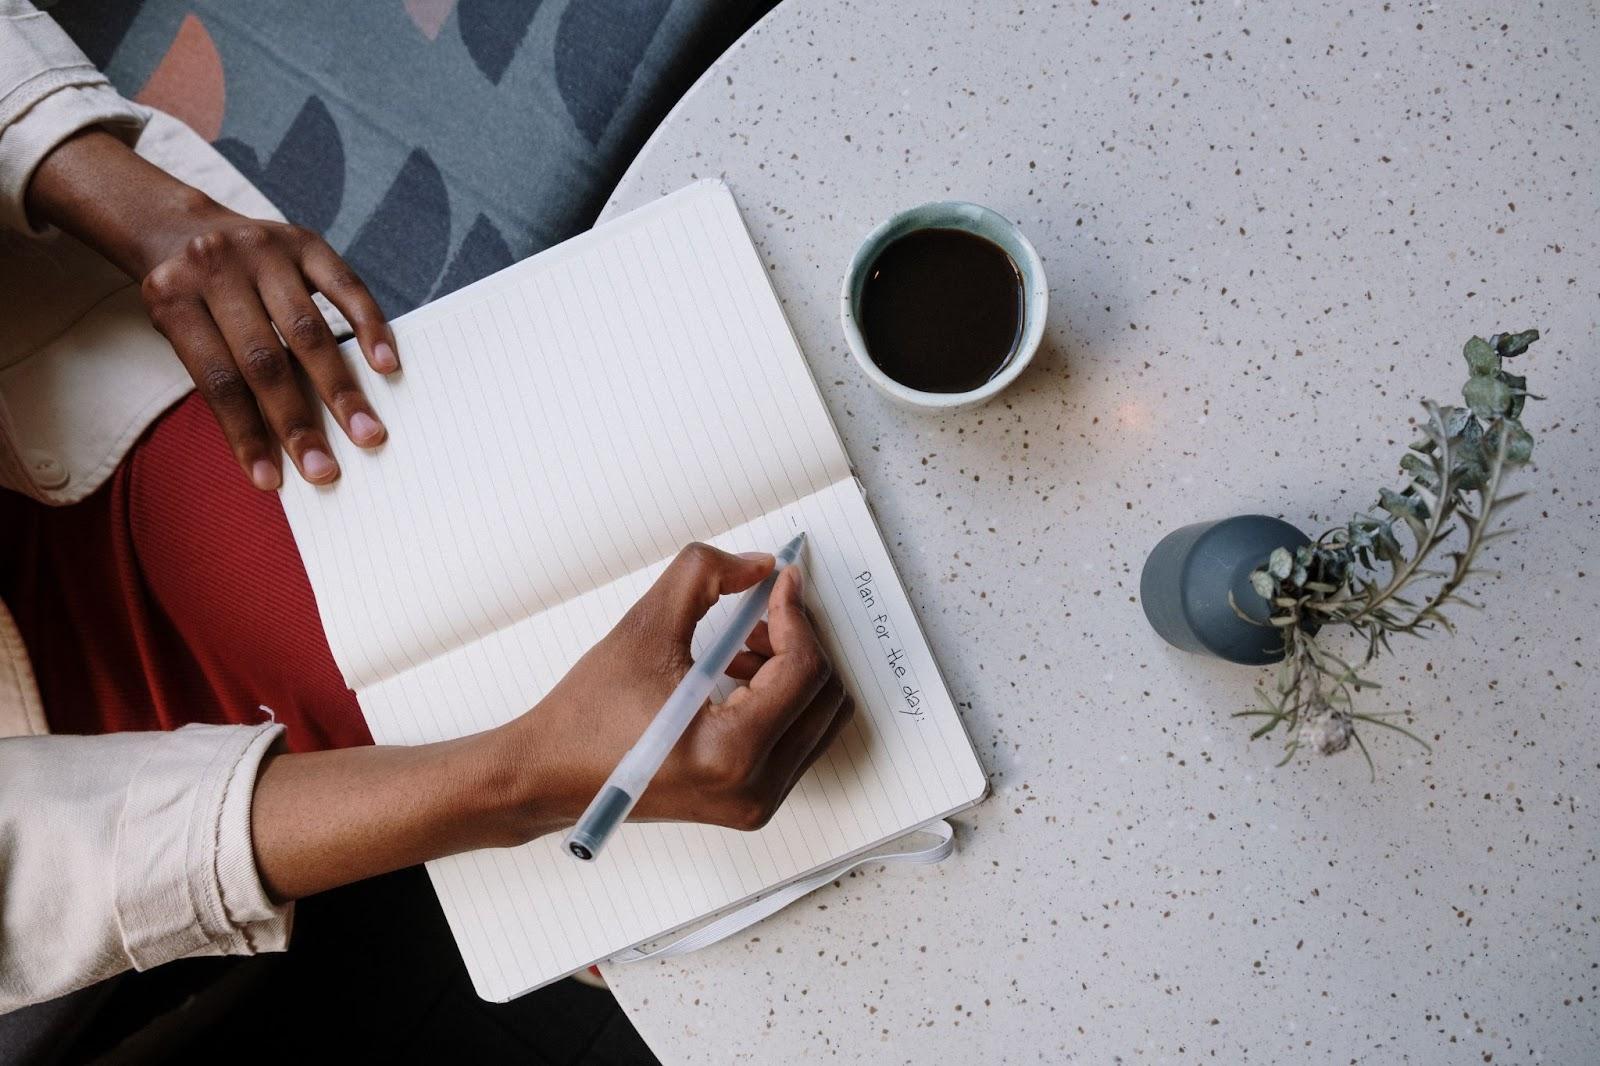 Woman journaling on a desk.